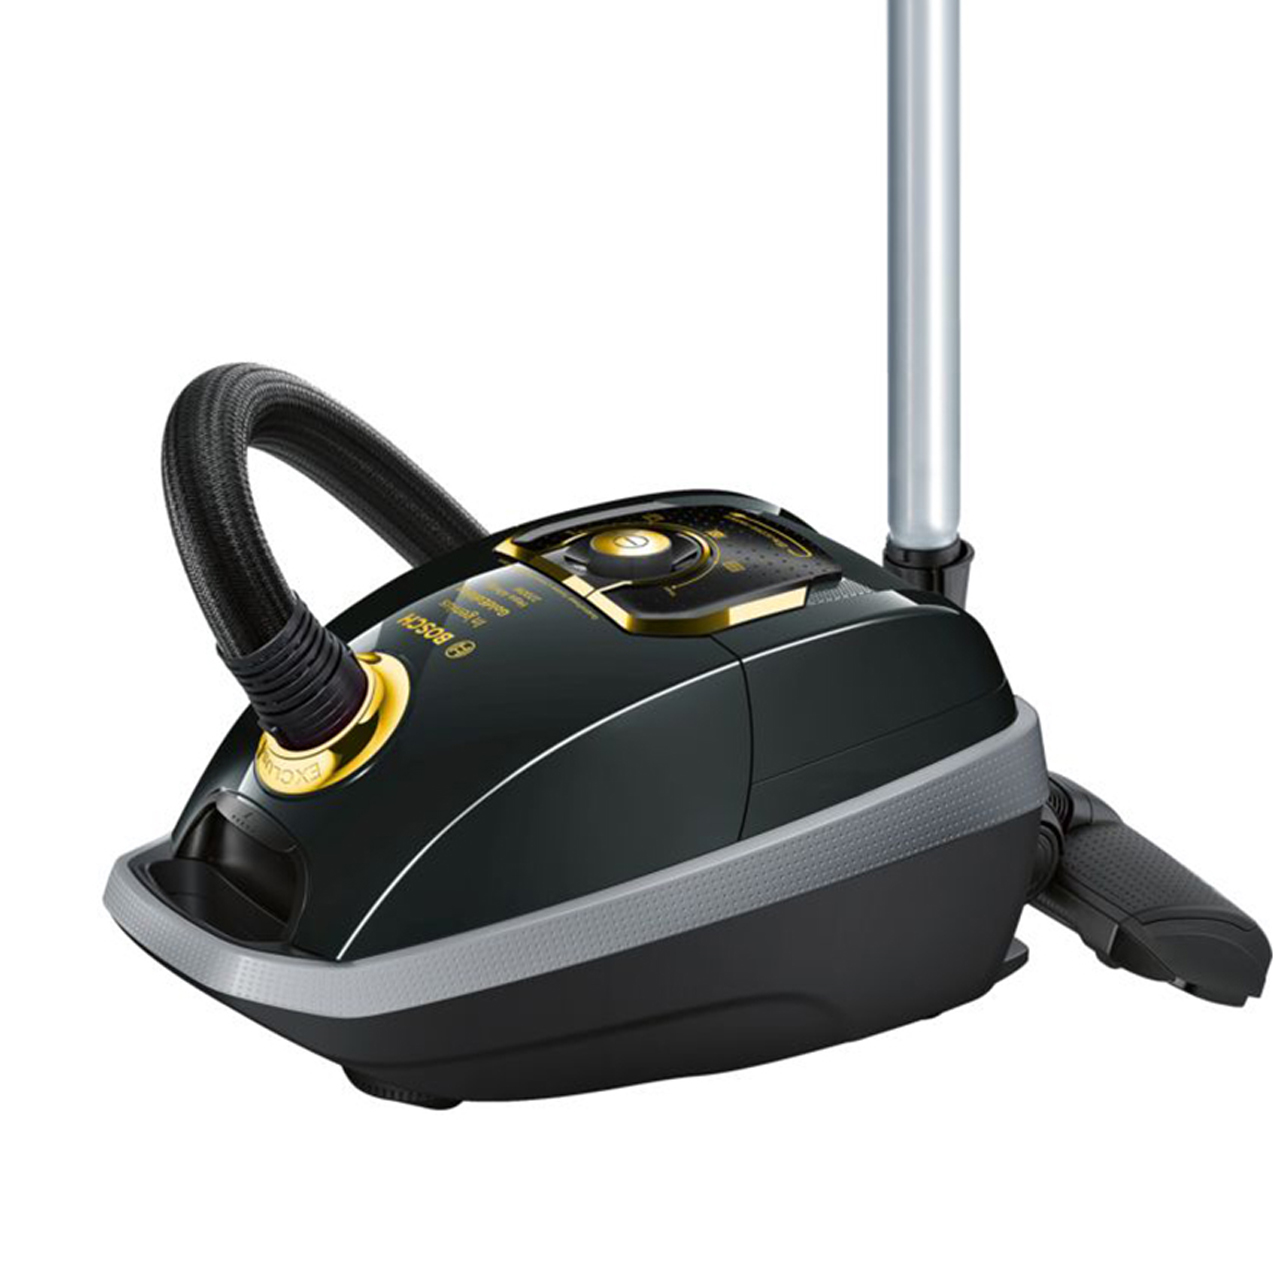 جاروبرقی گلدر بوش Bgl8Goldir Vacuum Cleaner Bosch